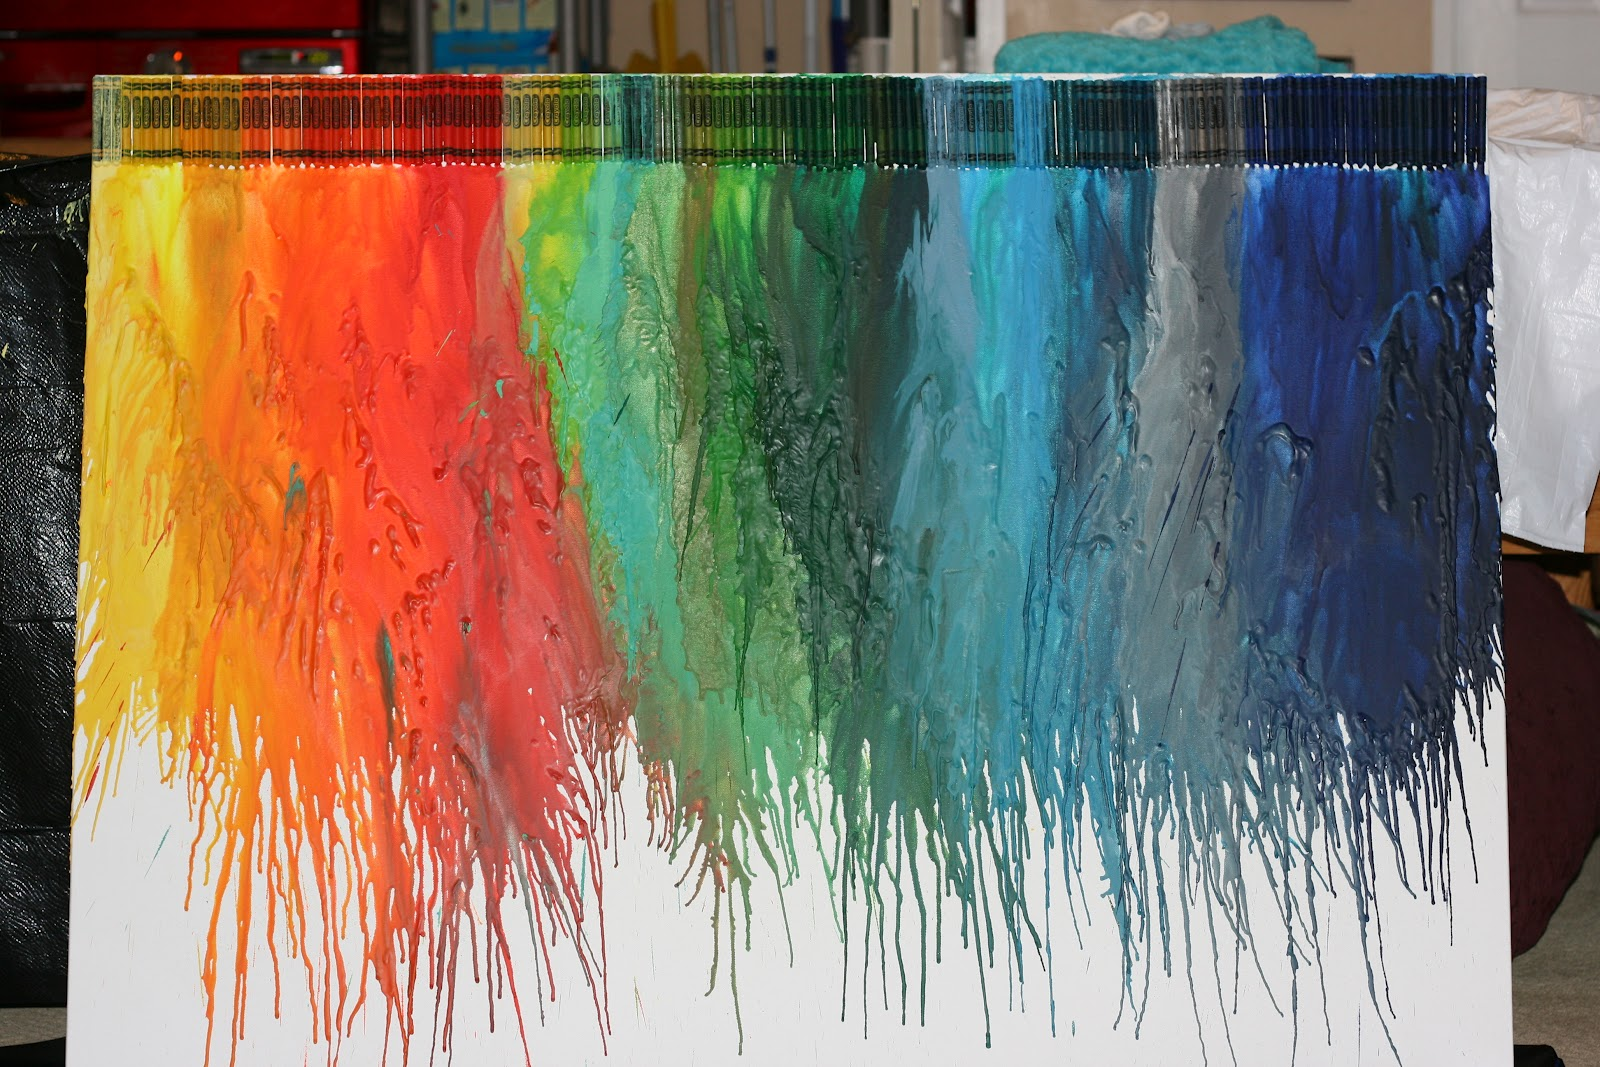 Wax Crayon Wallpaper   wallpaper